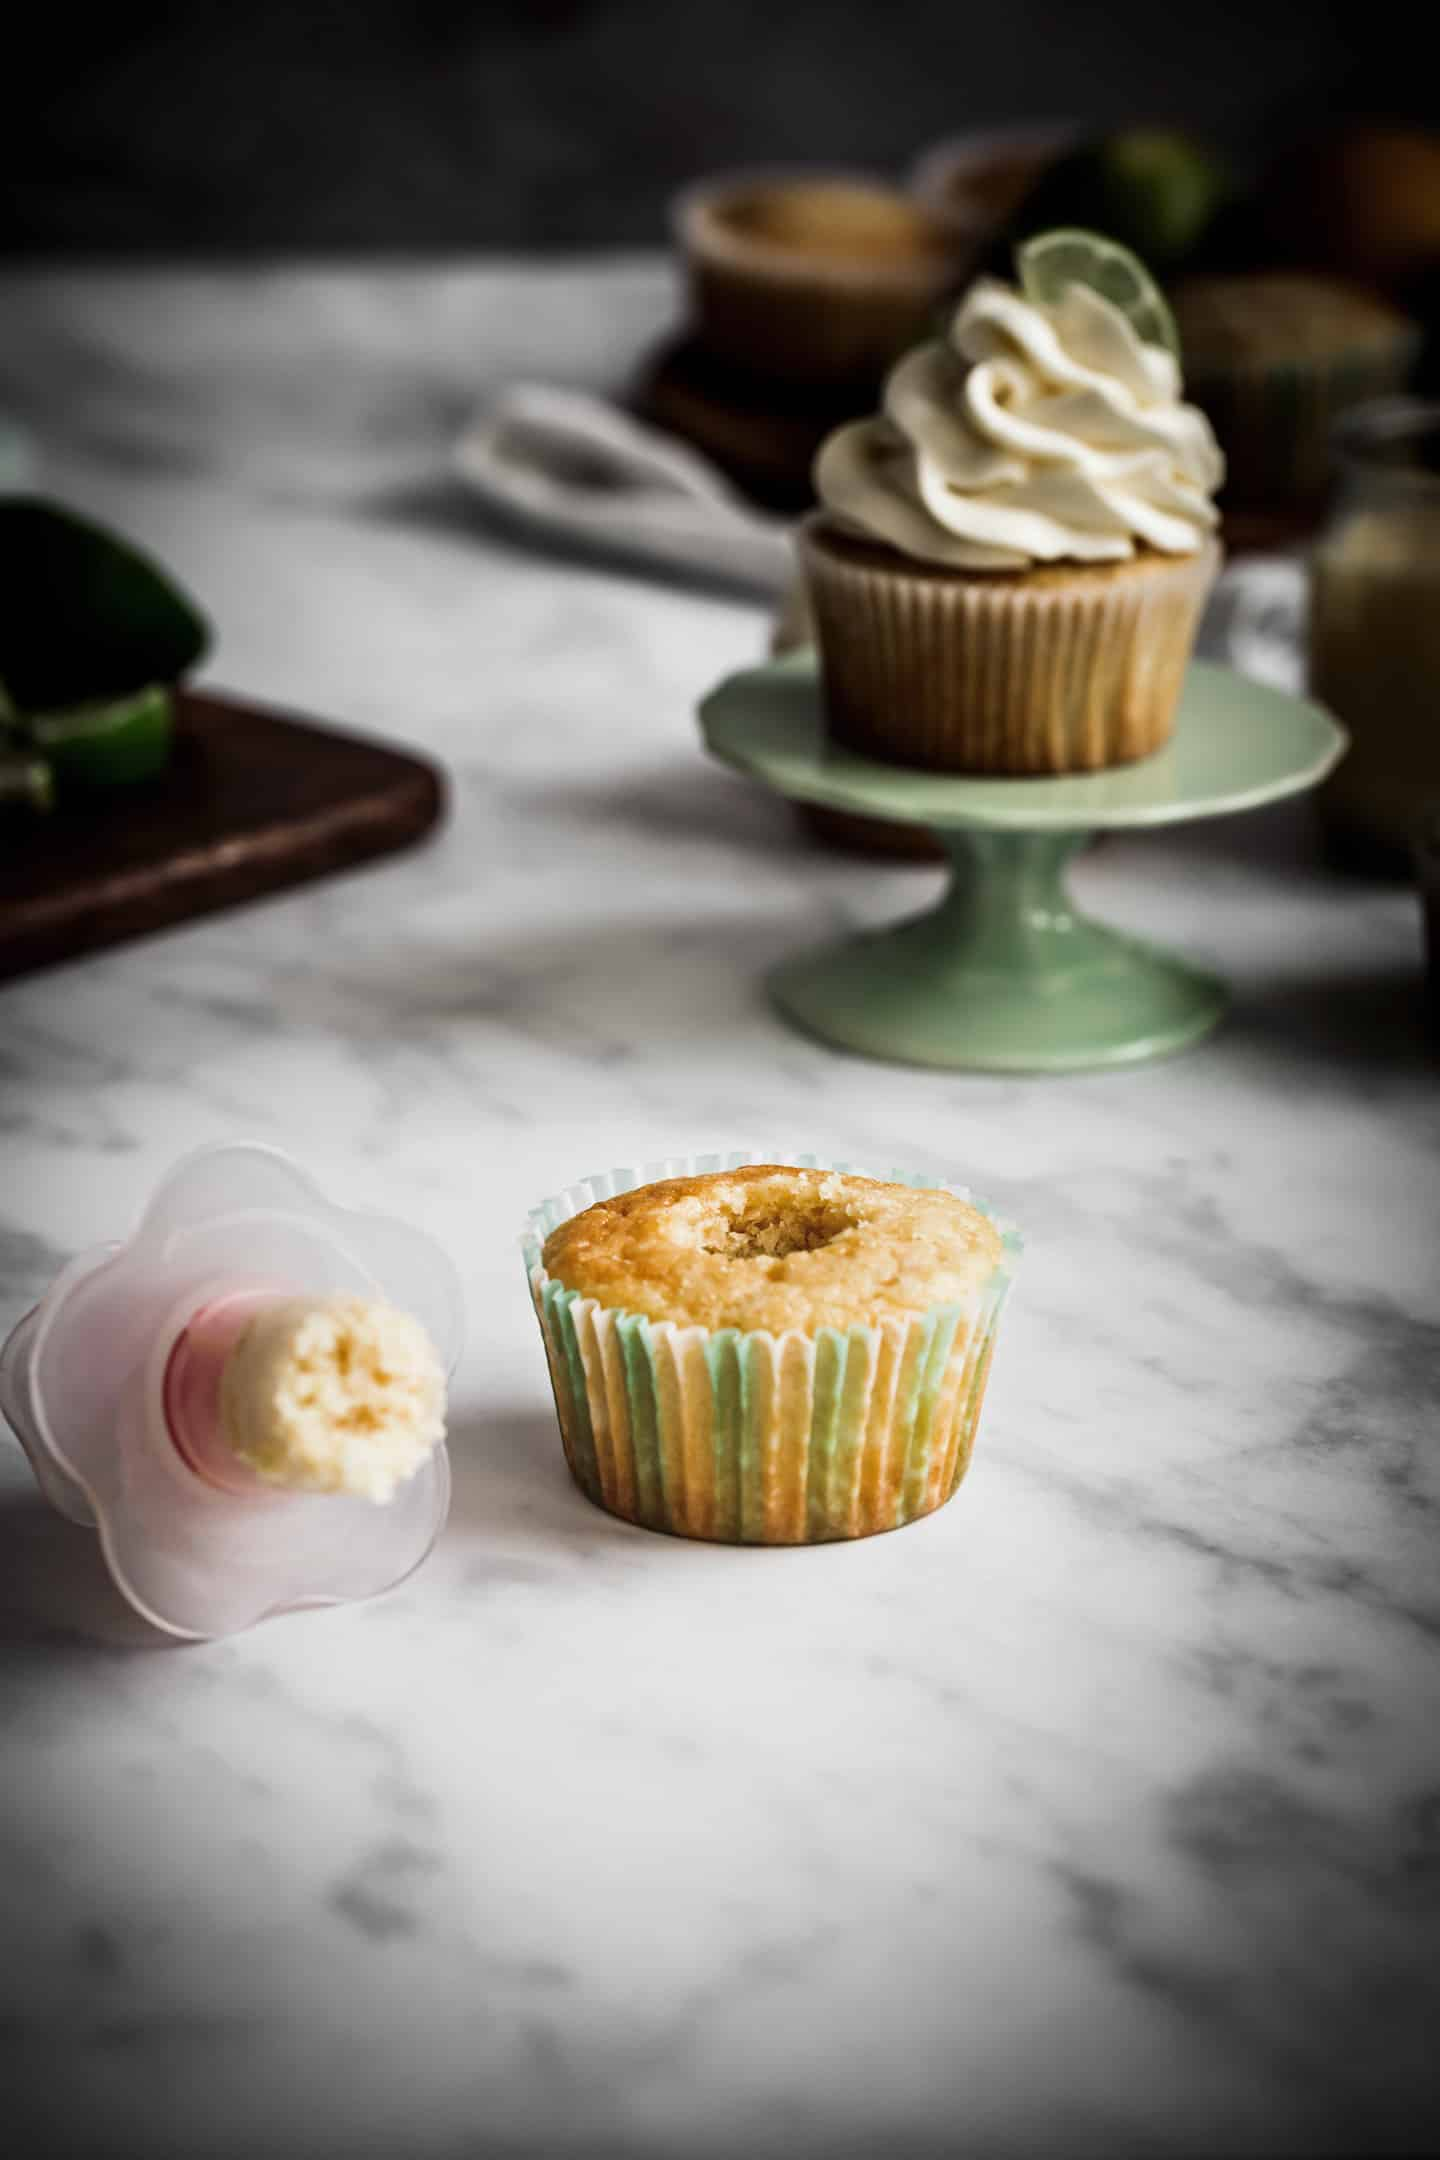 Evider le centre d'un cupcake